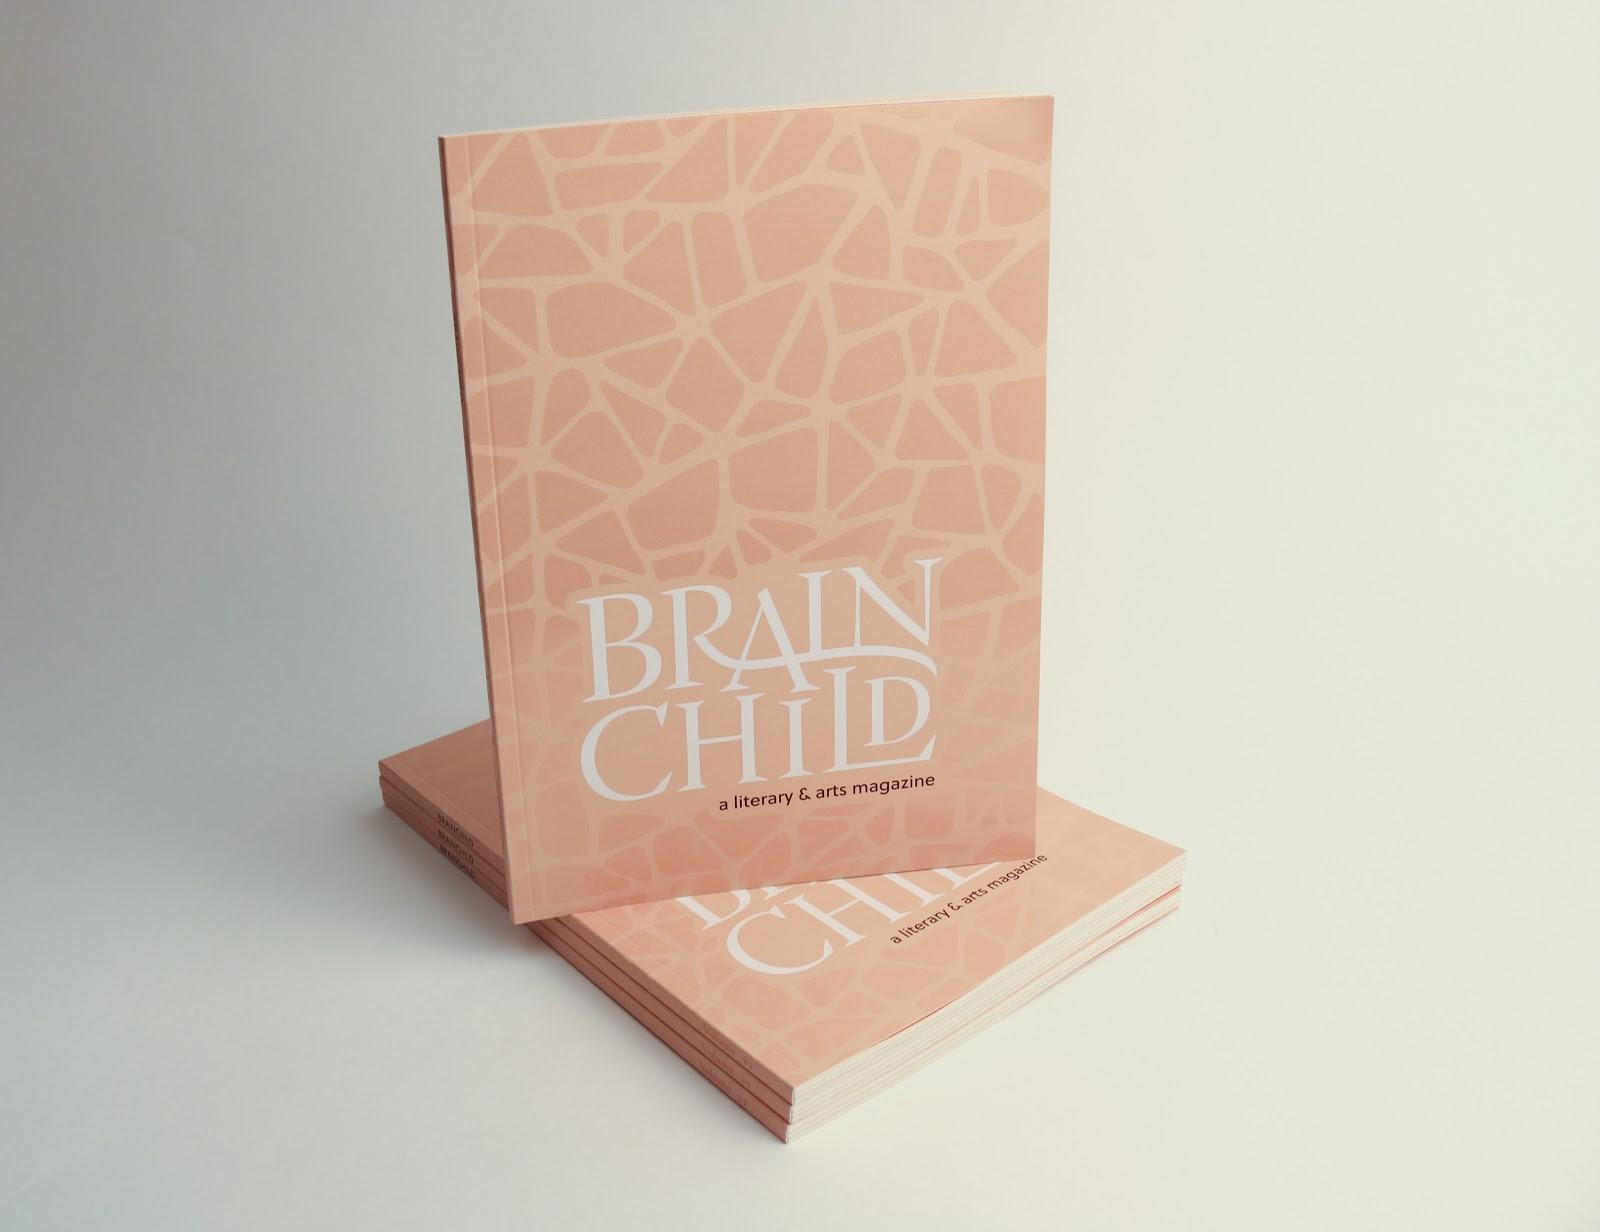 Brainchild Magazine, a Kent State student-run literary and arts magazine, received a Gold ADDY for magazine design.